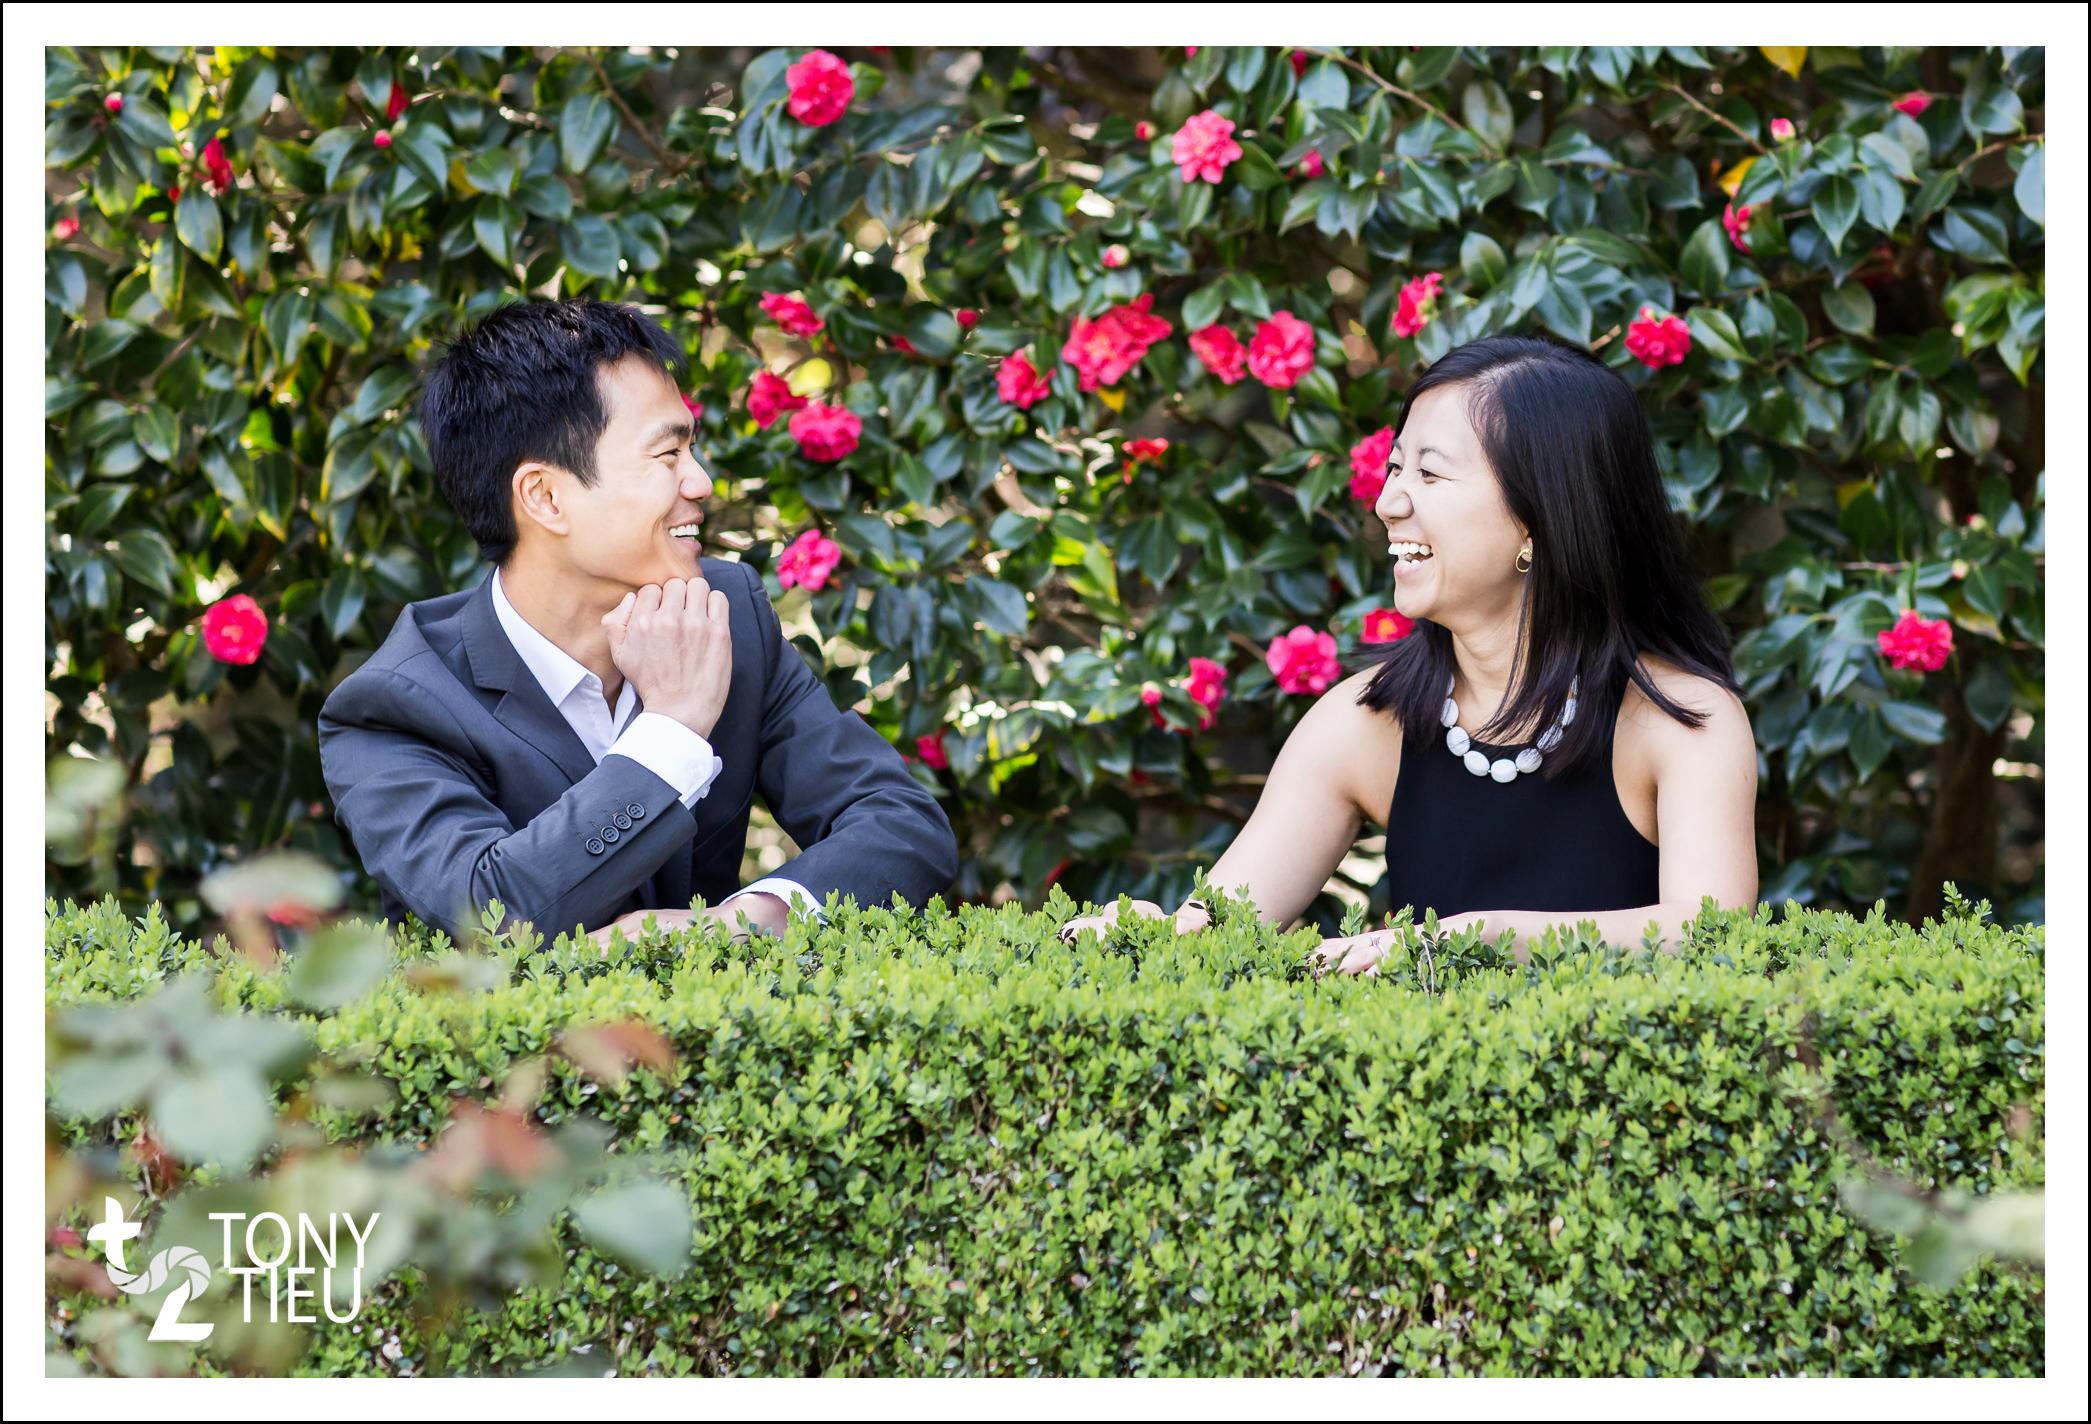 Tony_Tieu_Yang Jimmy_Engagement_4